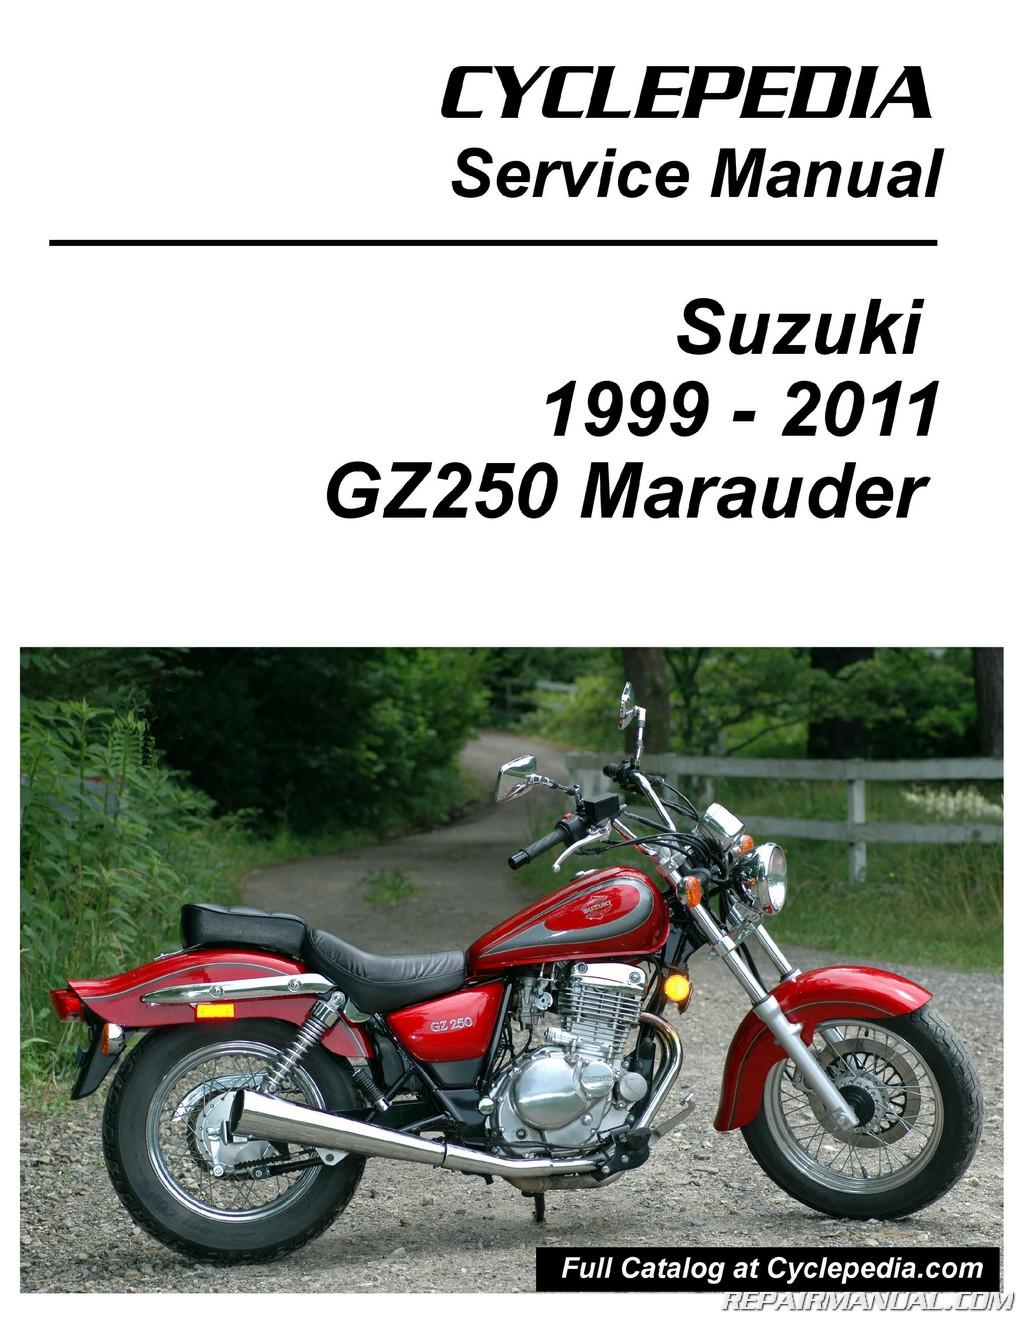 suzuki gz250 marauder cyclepedia printed service manual 800 426 suzuki gz250 marauder electrical system